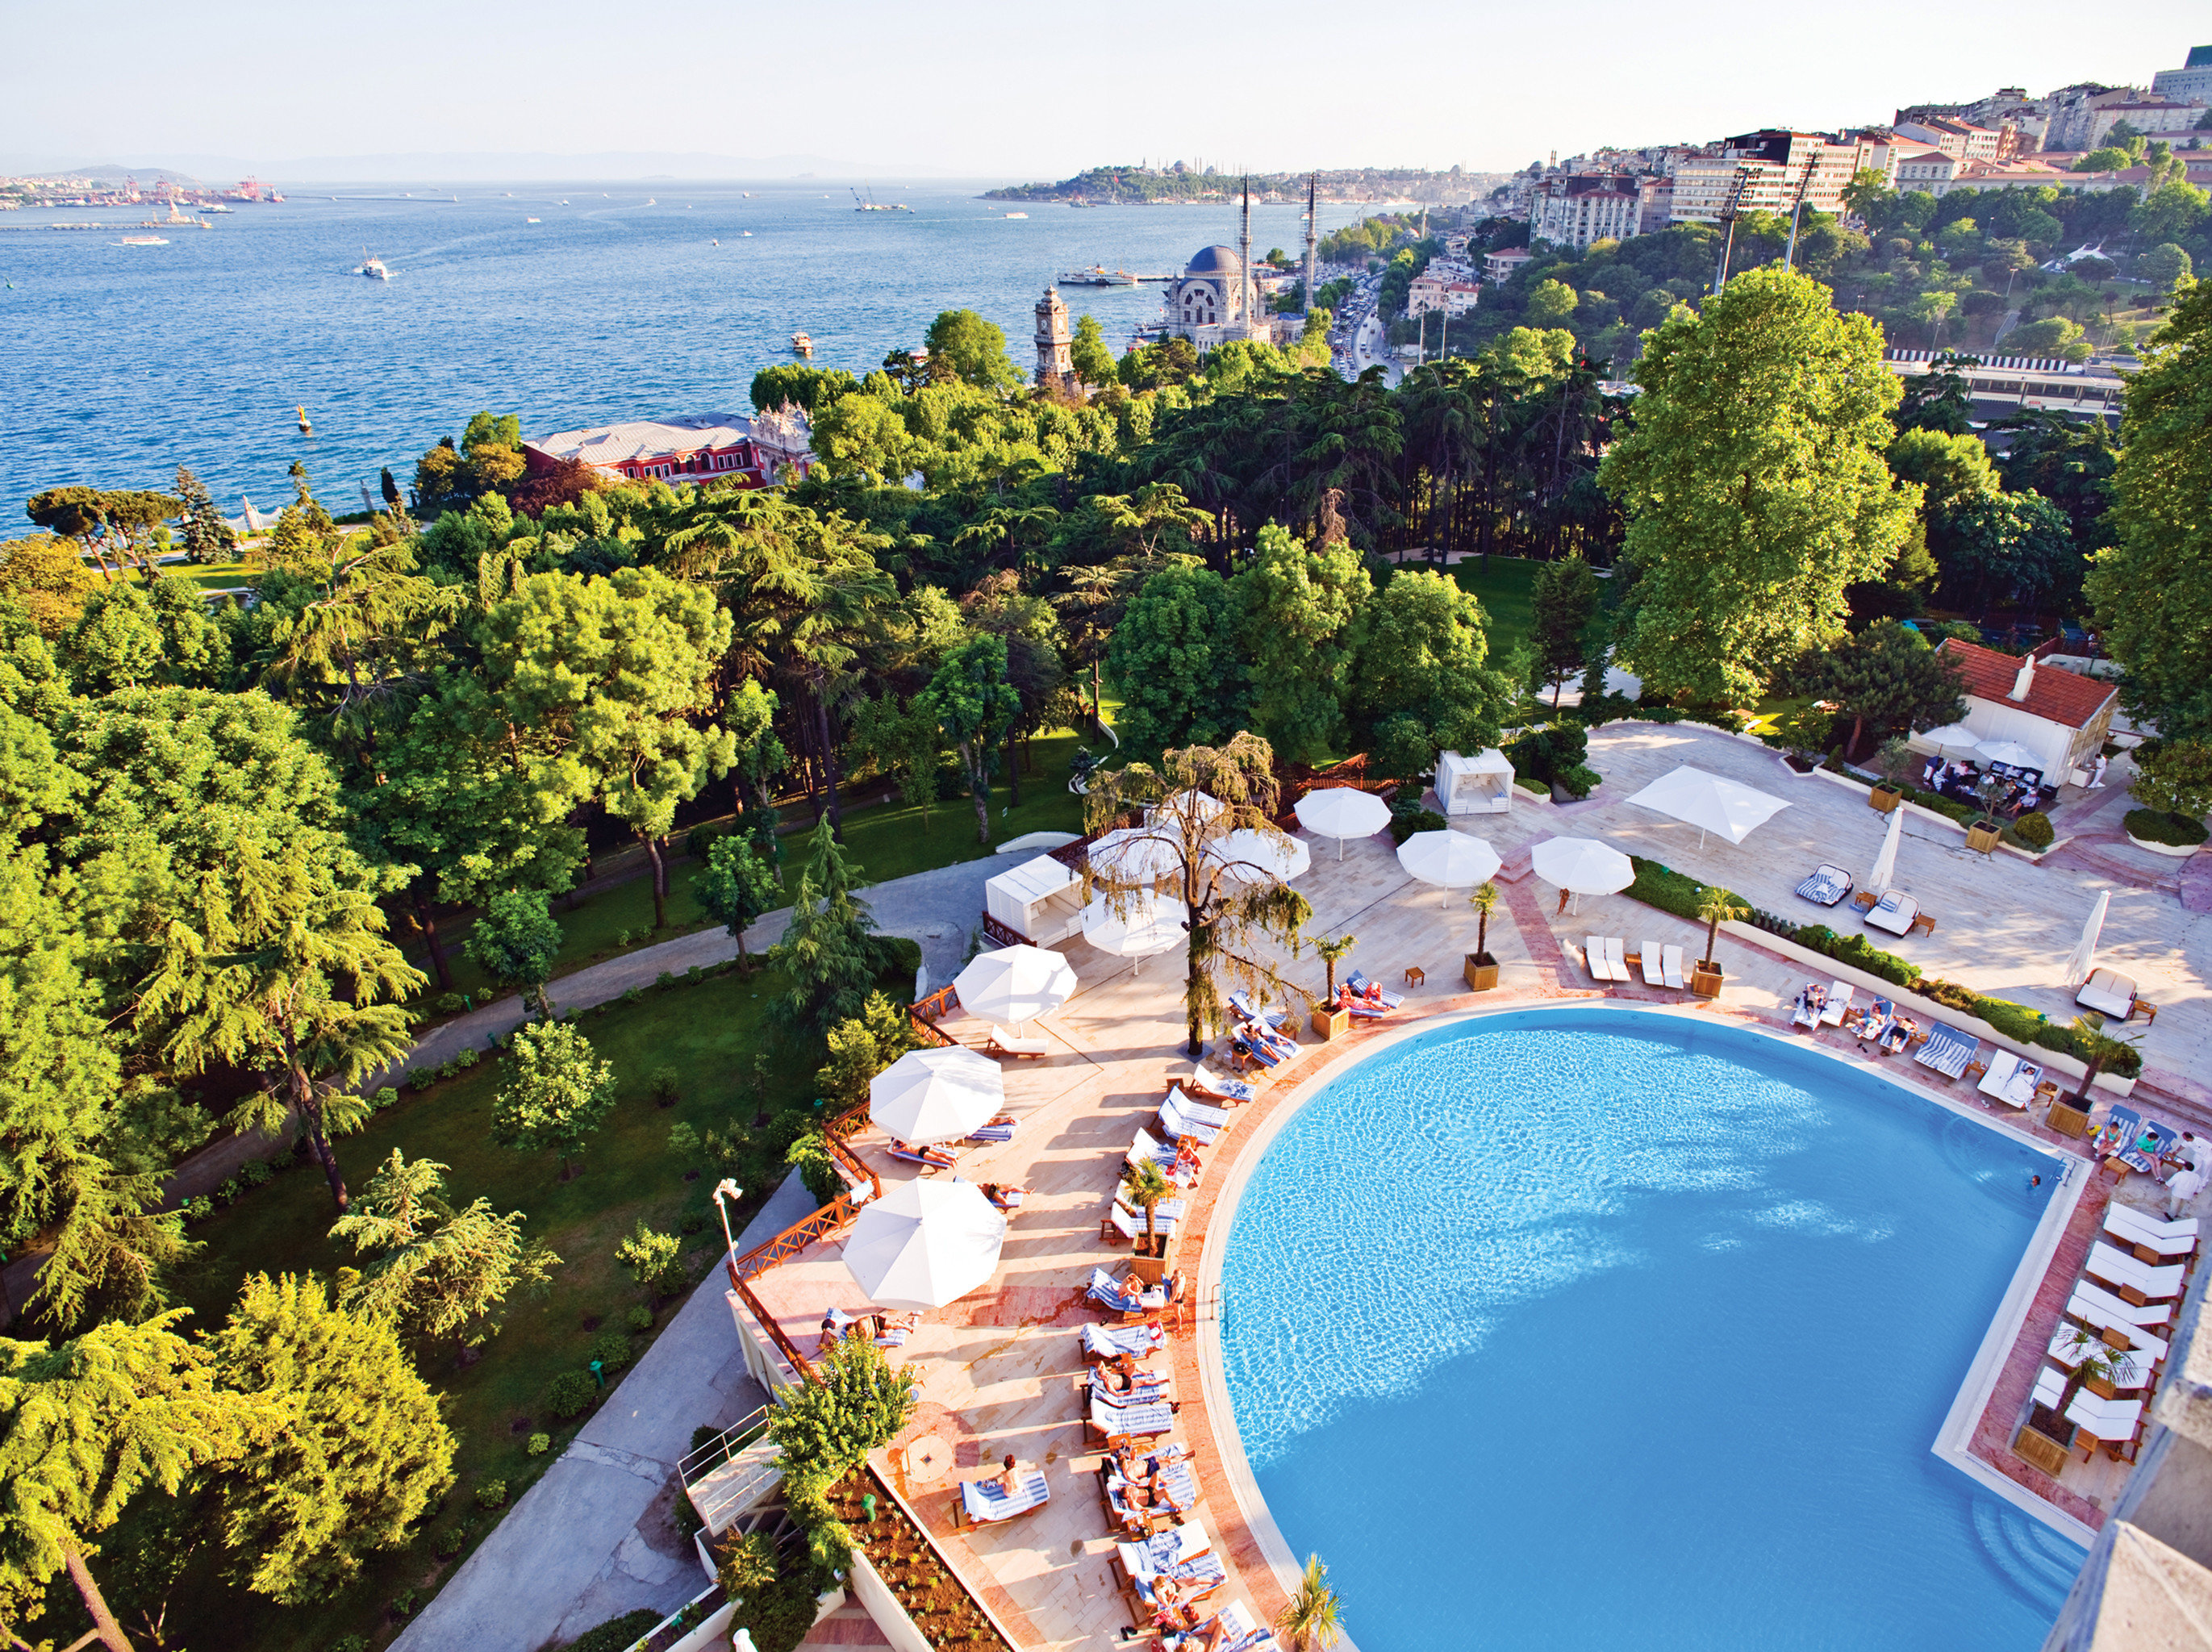 Beachfront Hip Lounge Luxury Modern Pool tree leisure Resort swimming pool Sea Coast amusement park Water park park